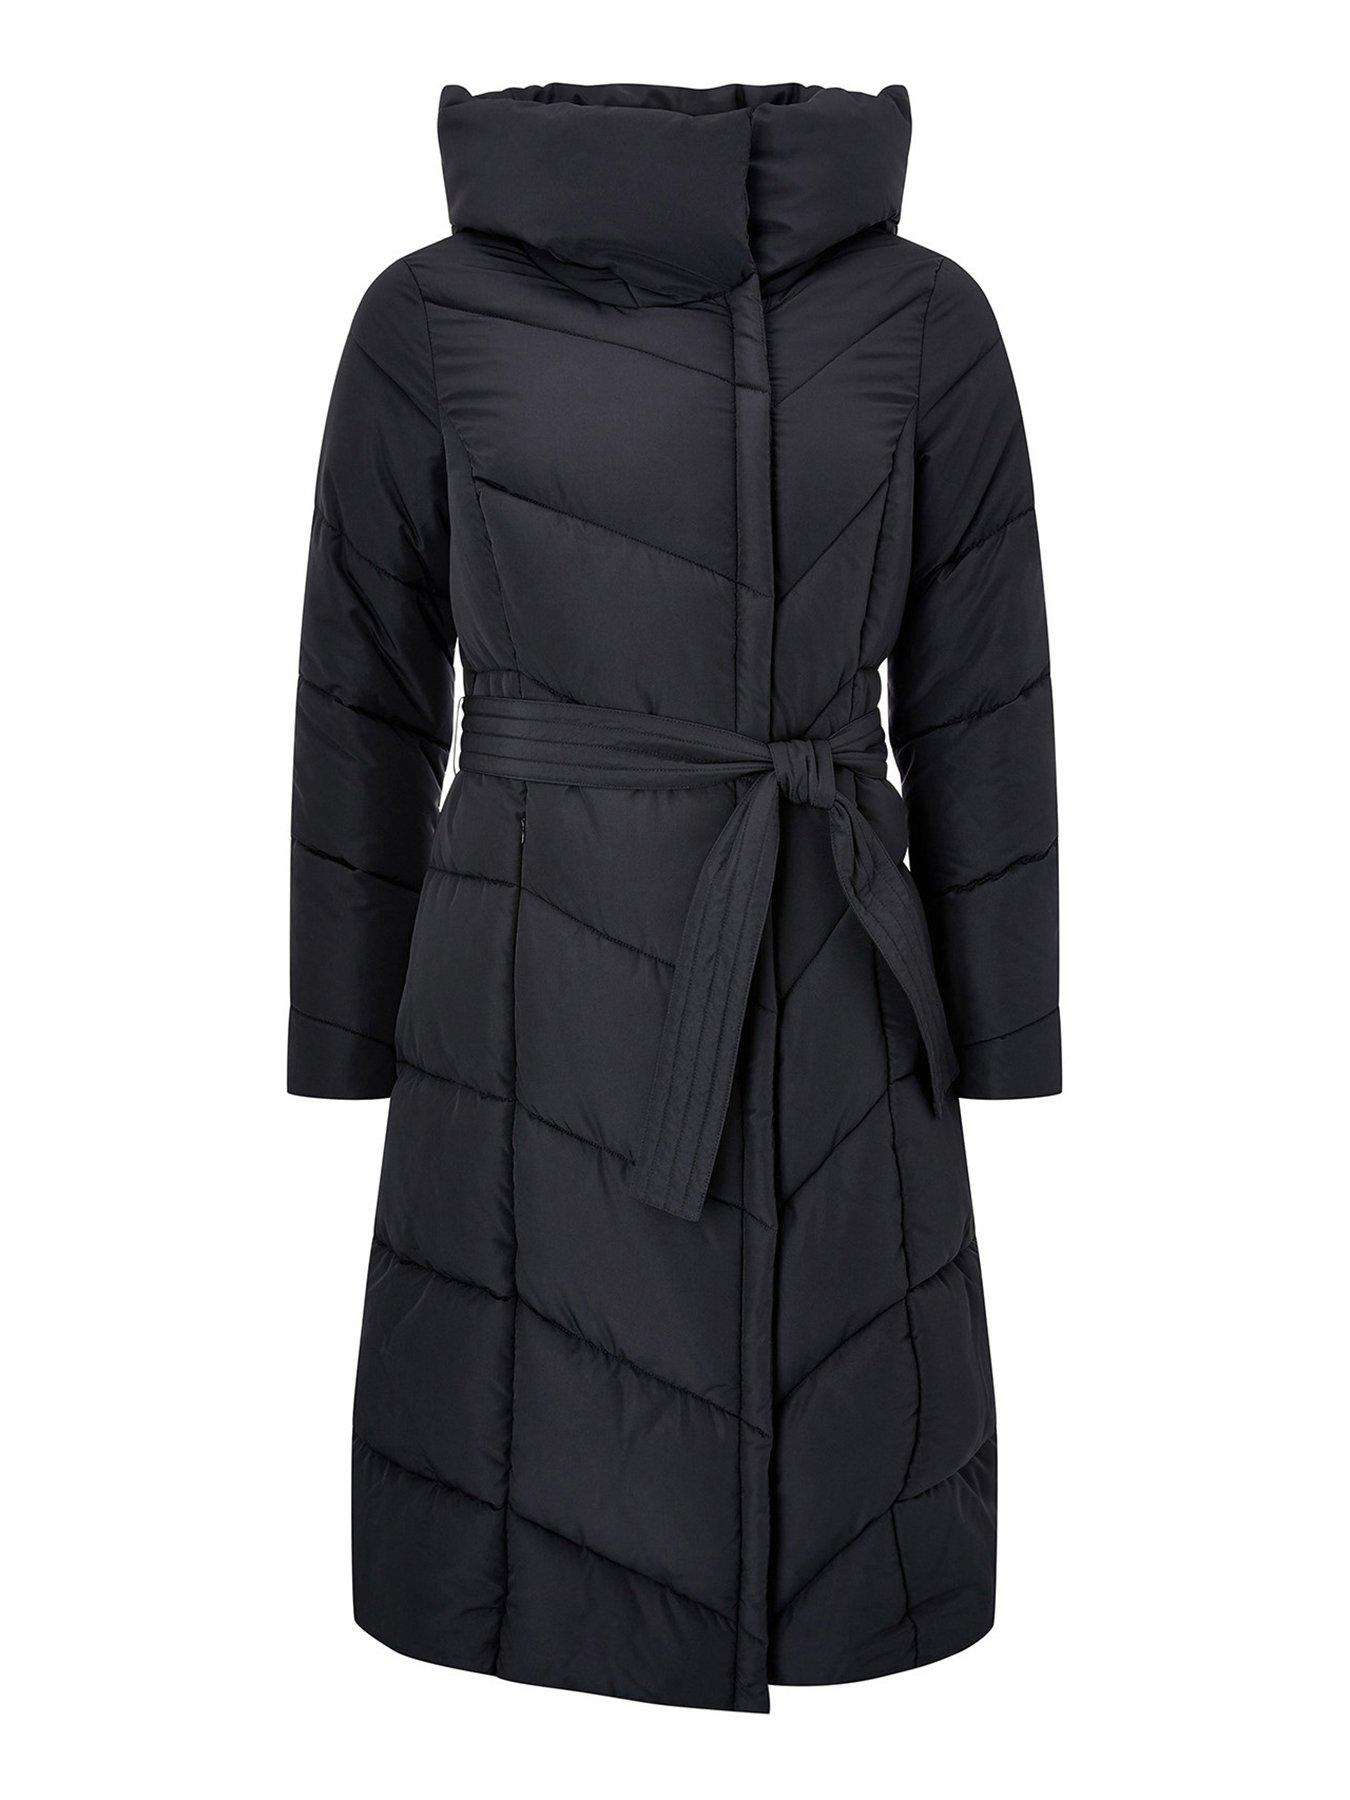 Wide range of variety of ladies coats ladies coats most